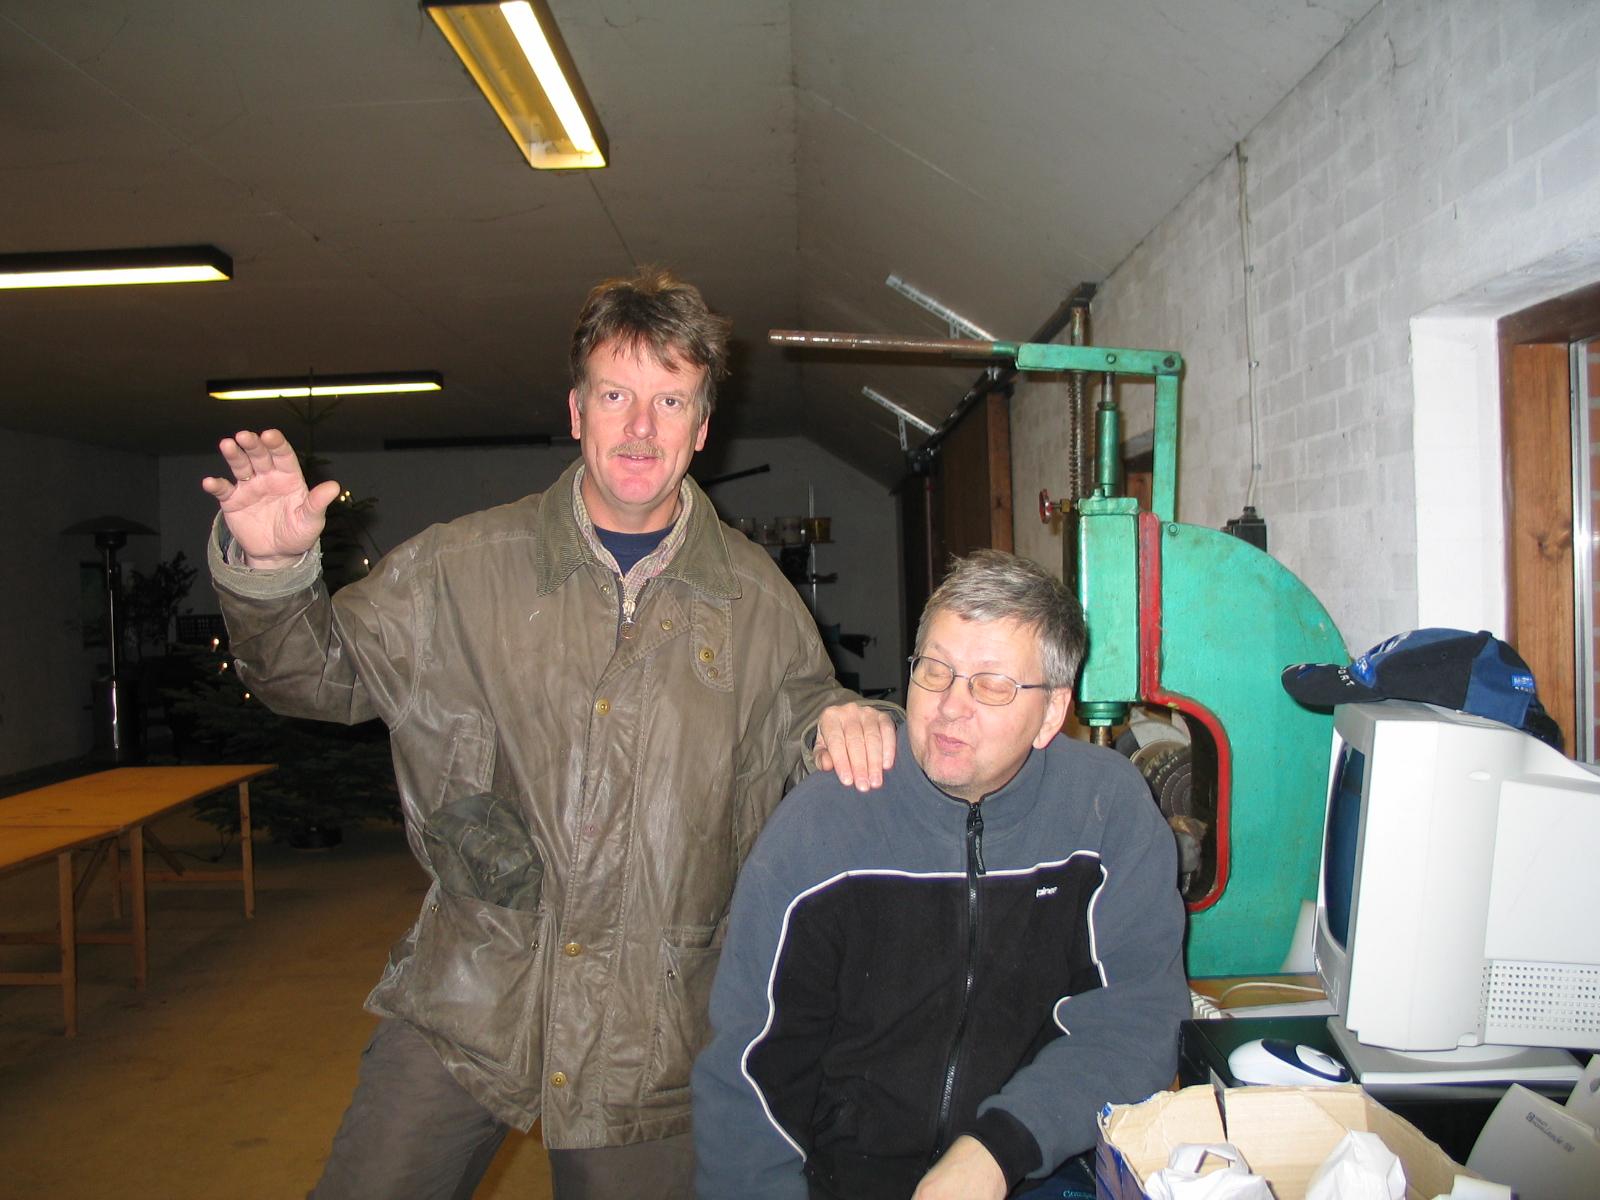 Morgenholdet Steen Normann og Knud Møller